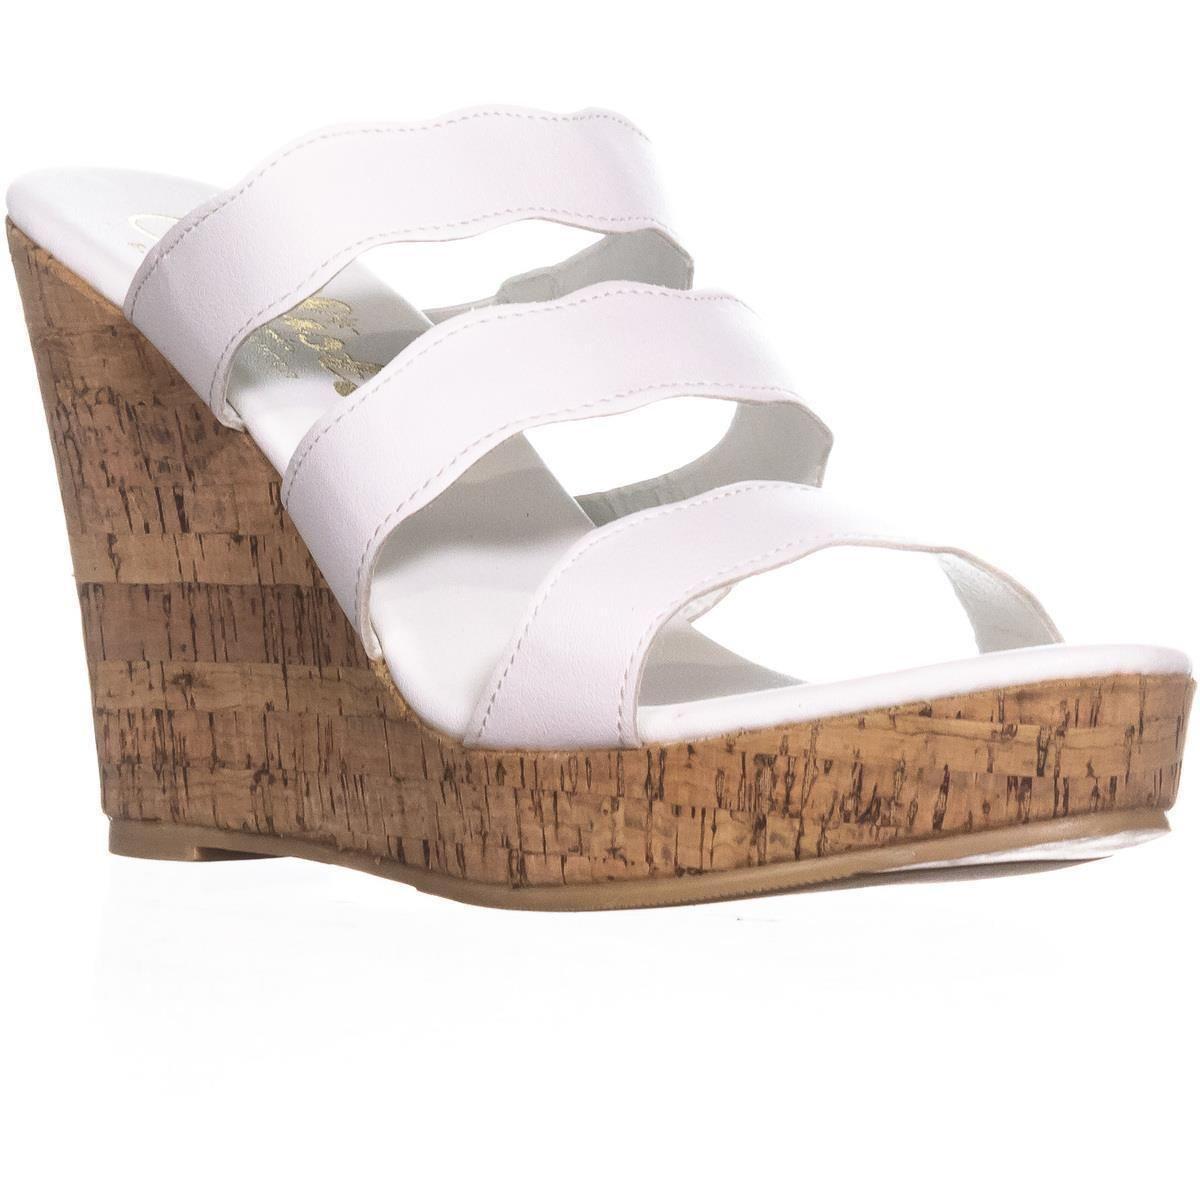 6e9775bd35b2 Lyst - Callisto Flure Triple Strap Wedge Sandals in White - Save 60%